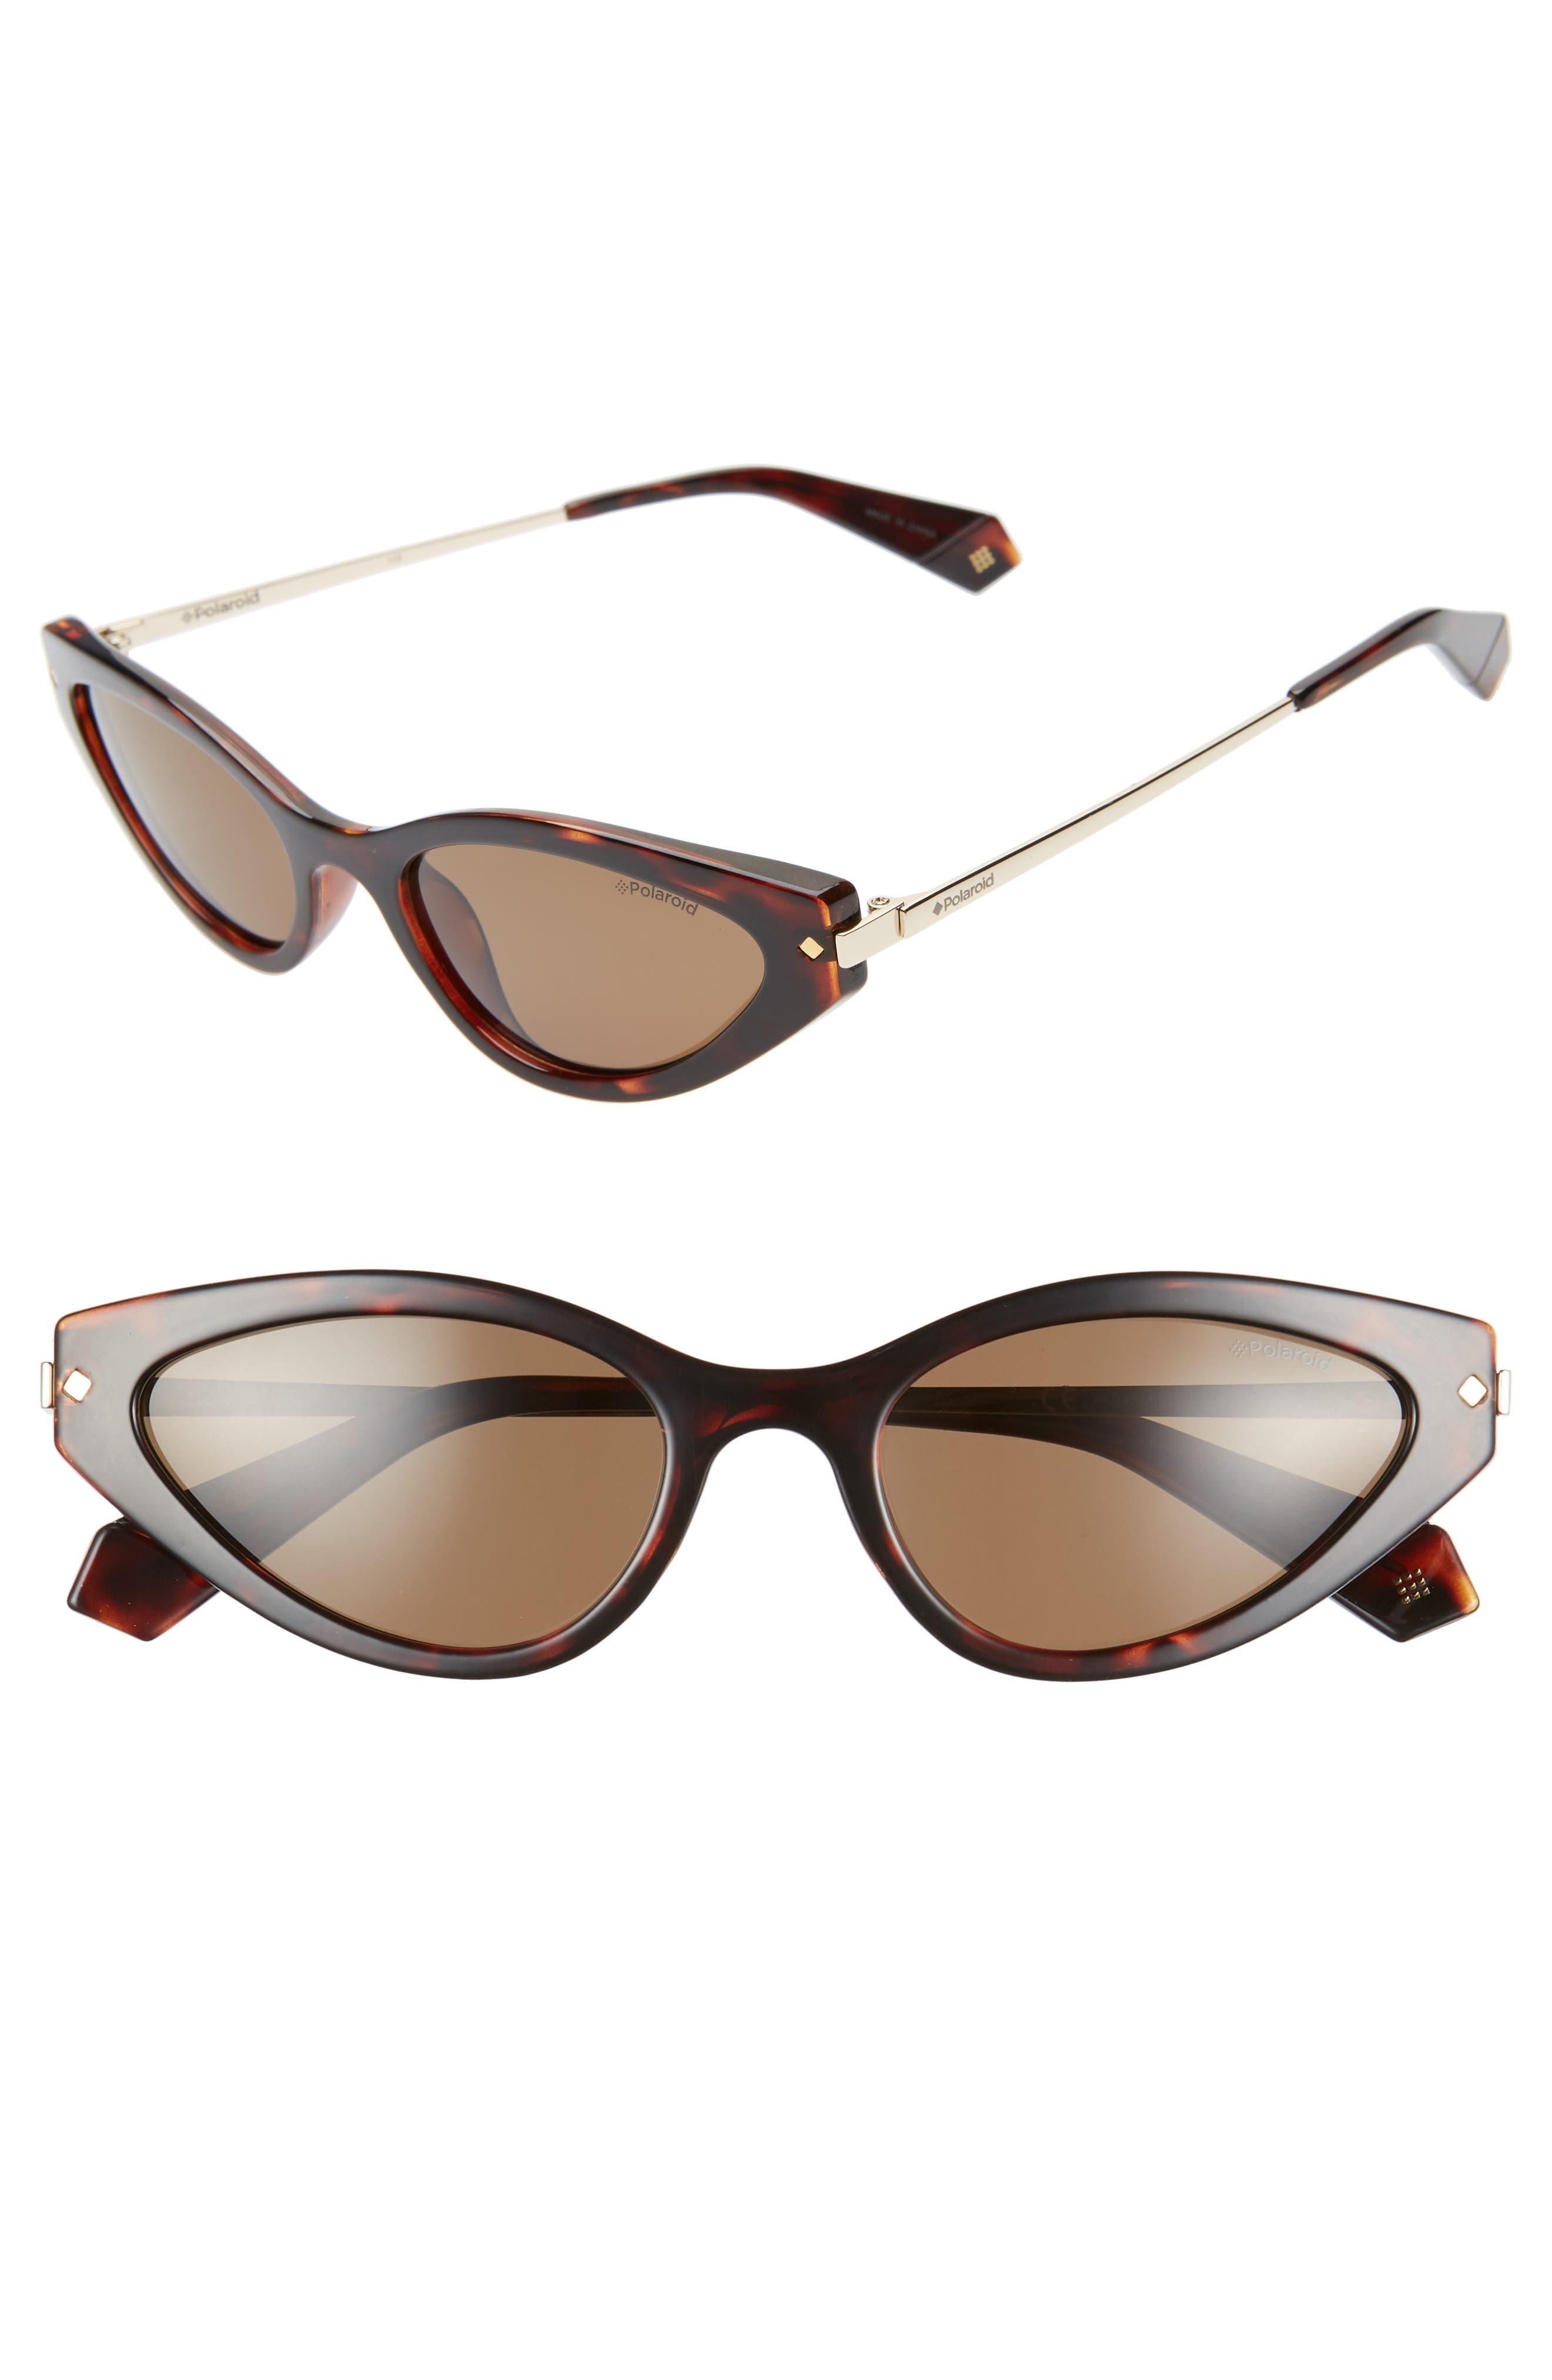 Polaroid 5m Polarized Cat Eye Sunglasses - Dark Havana